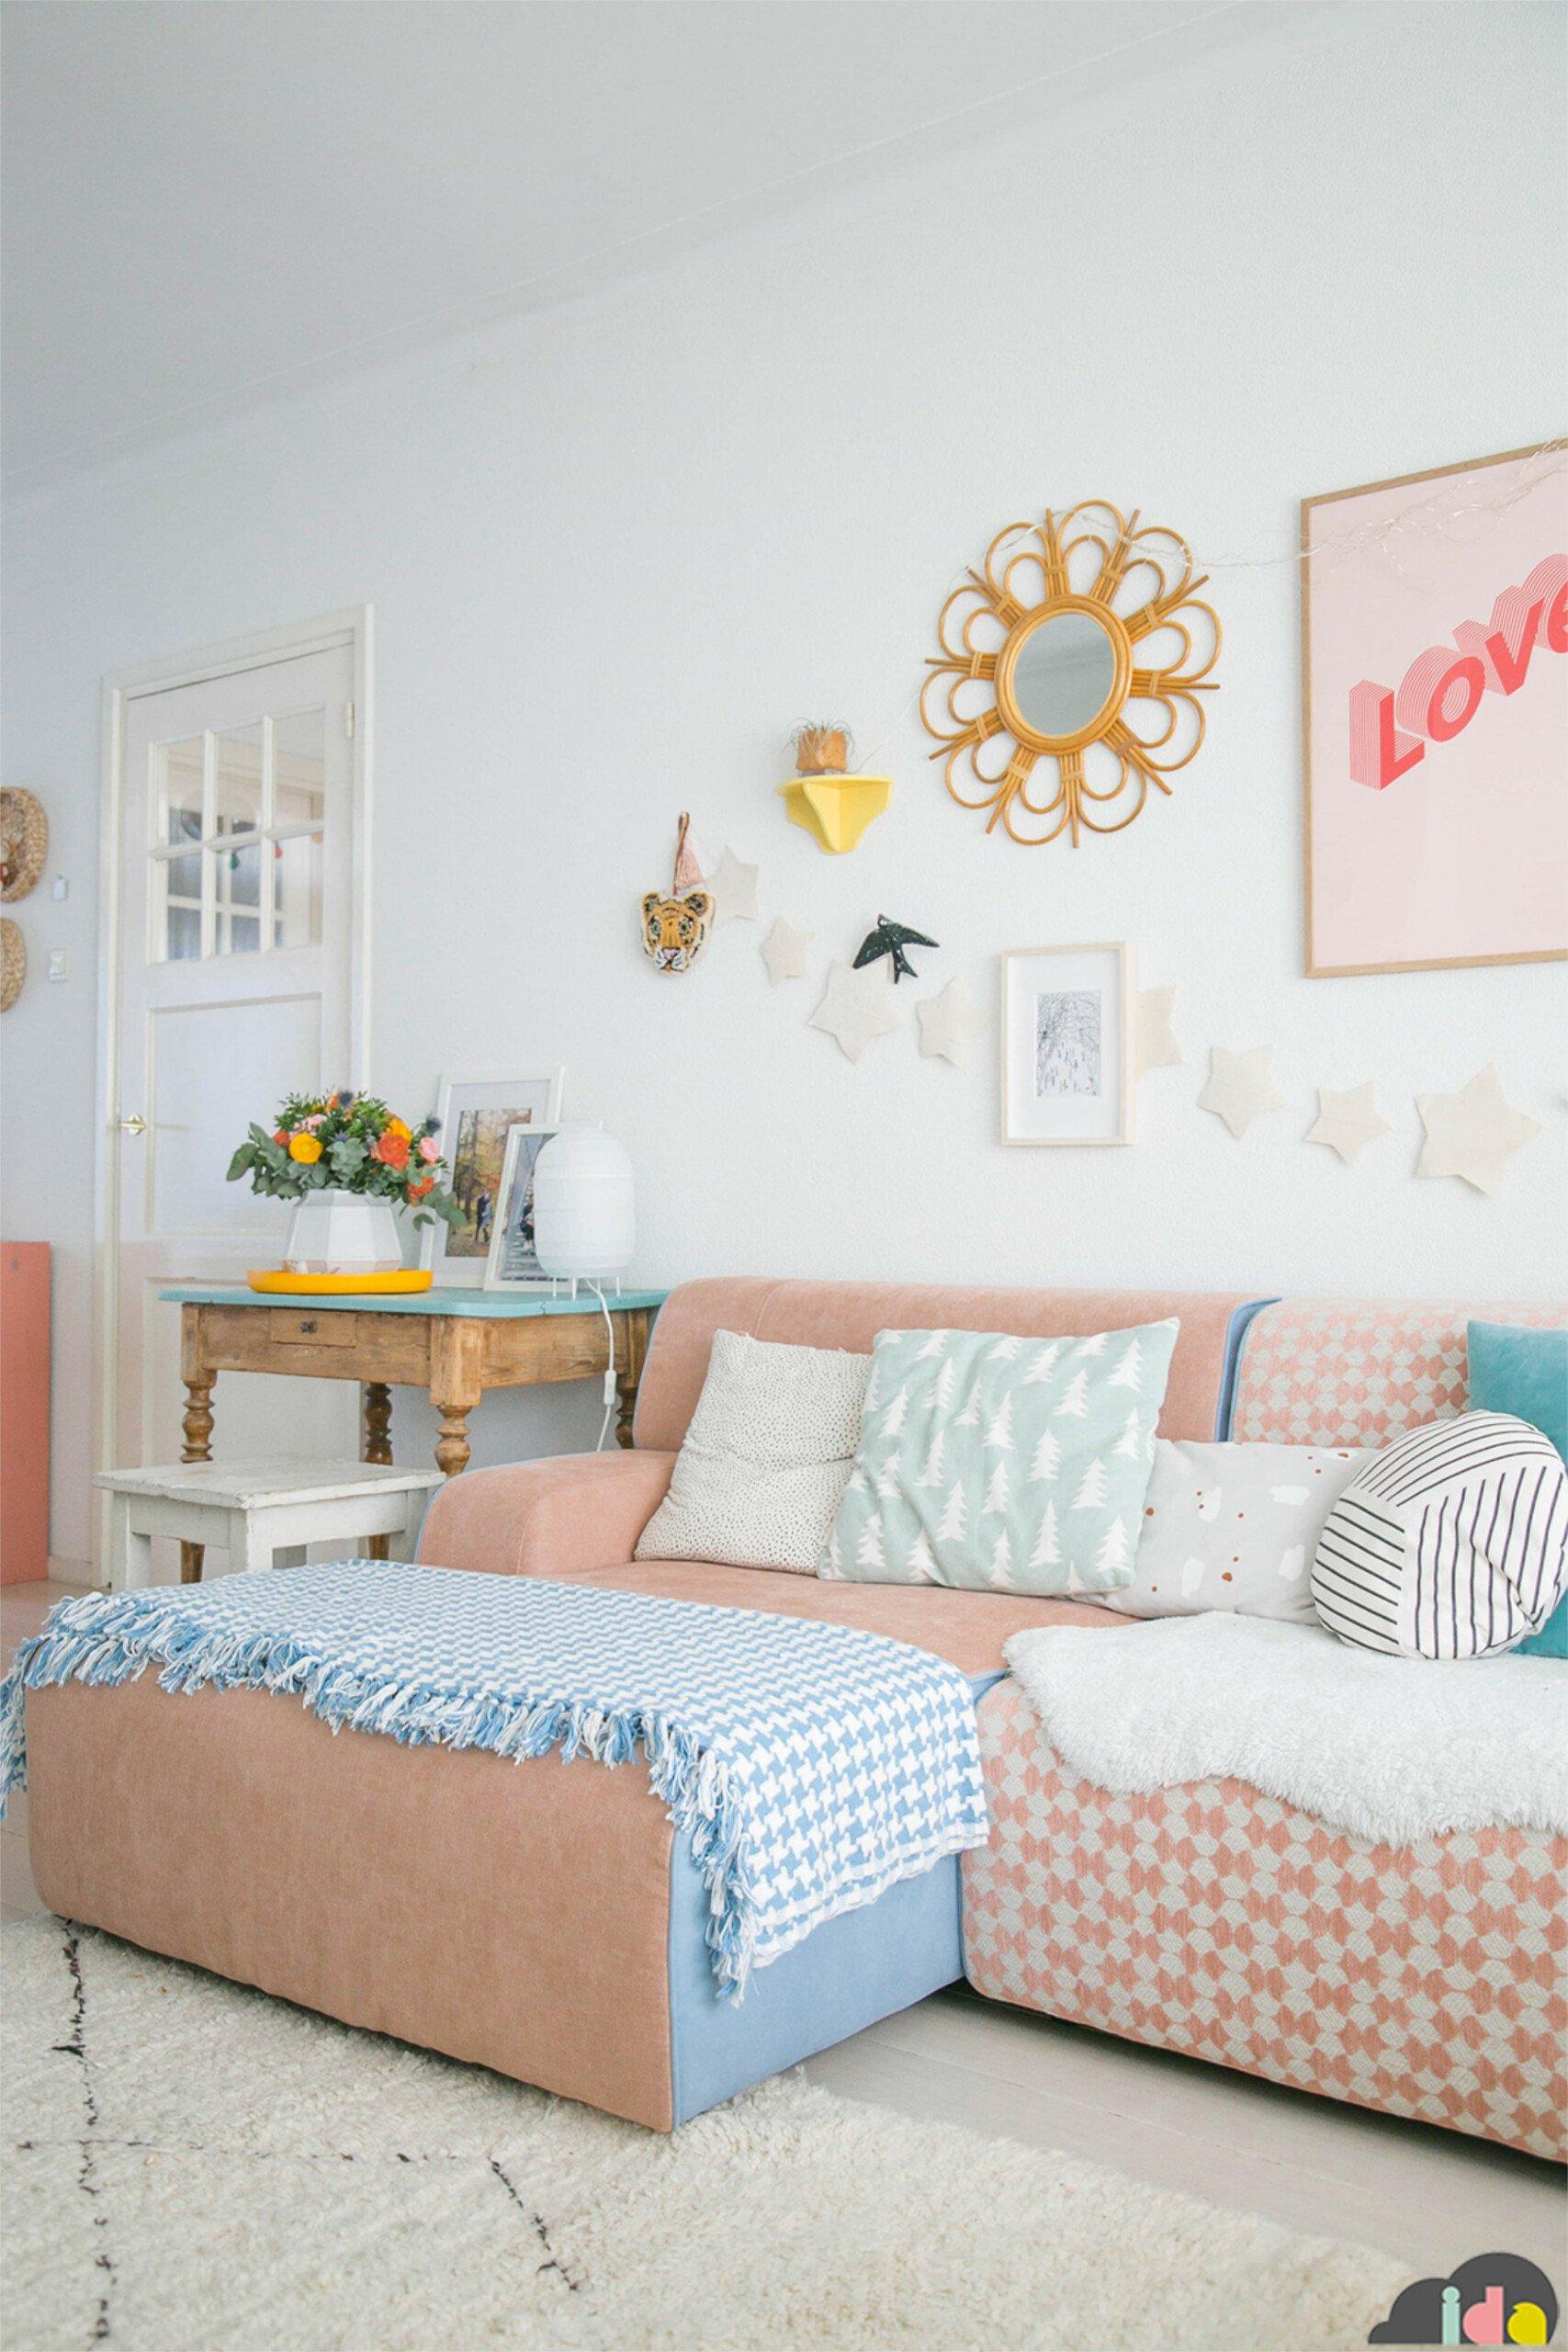 IDAinteriorlifestyle 14 livingroom sofa home scaled